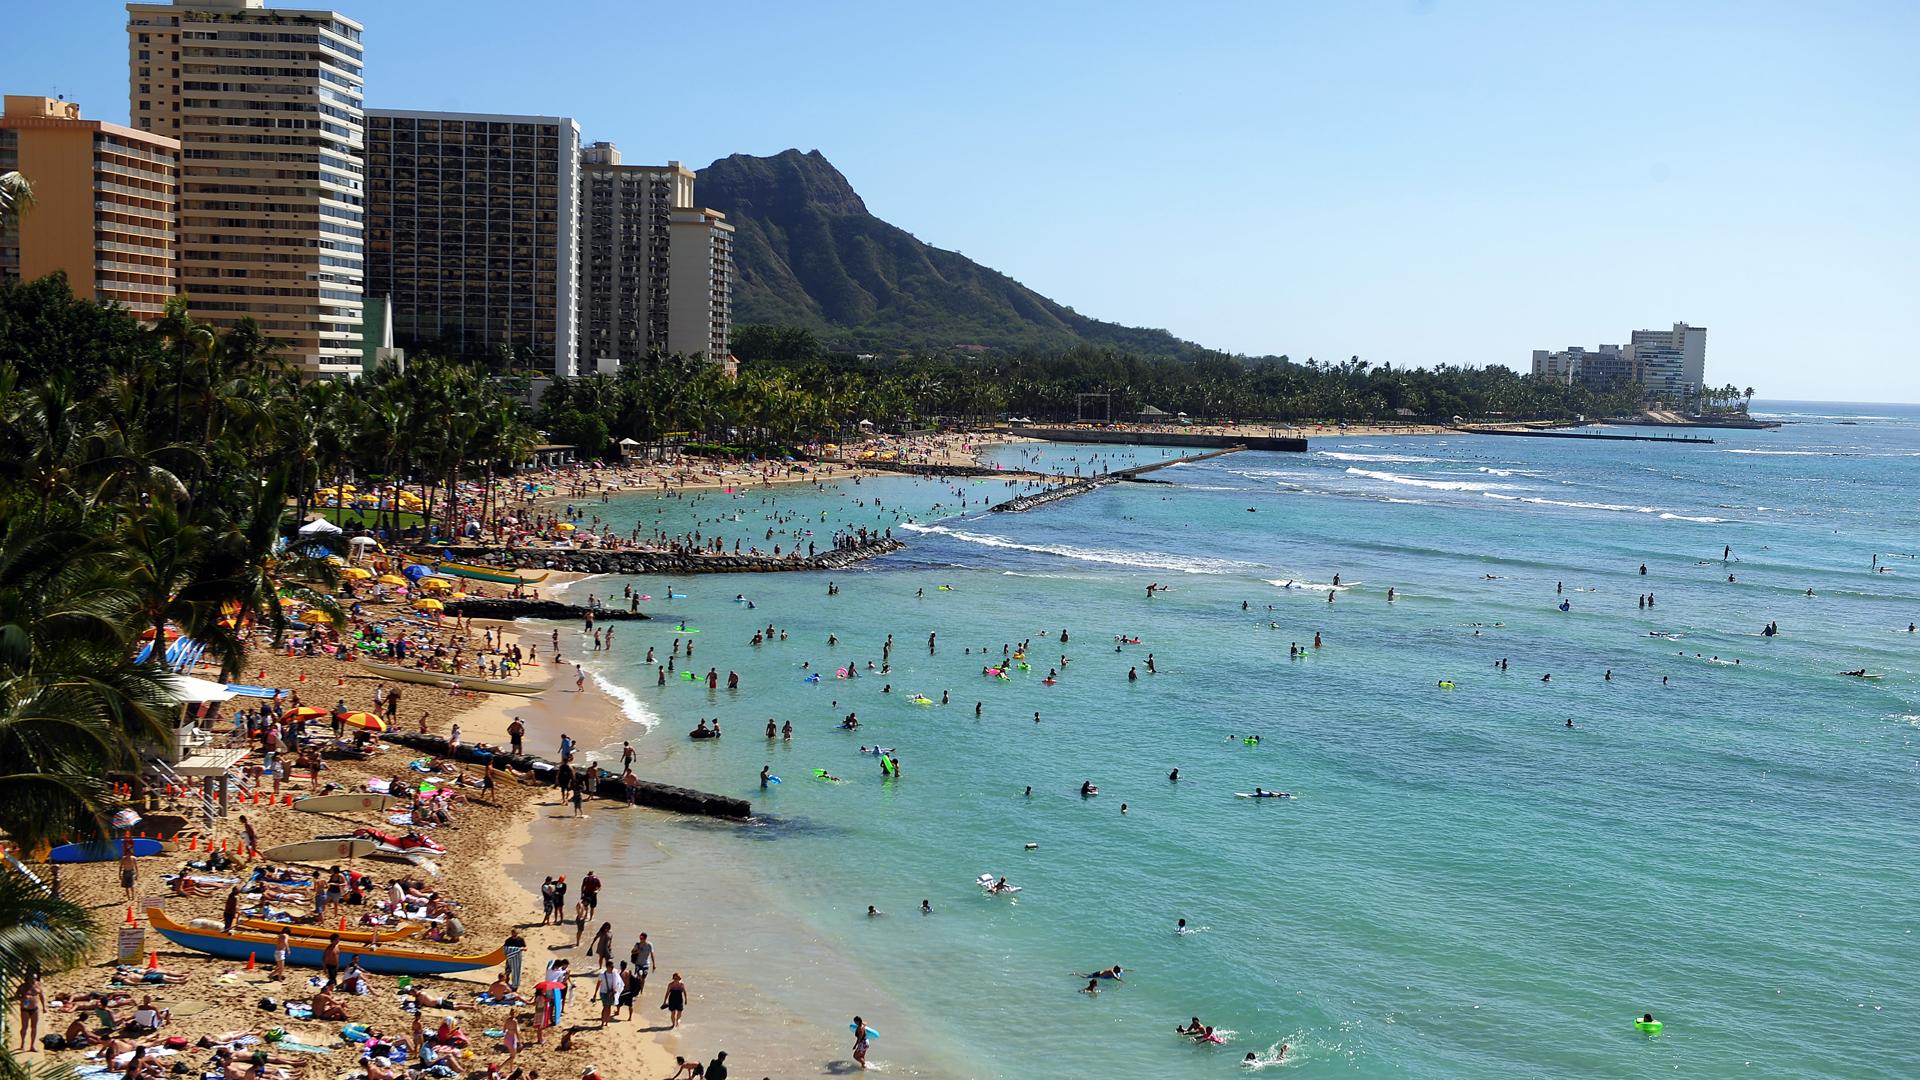 Tourists enjoy sunbathing, surfing, boating and swimming at Waikiki beach in Honolulu, Hawaii, on Jan. 1, 2010. (JEWEL SAMAD/AFP via Getty Images)